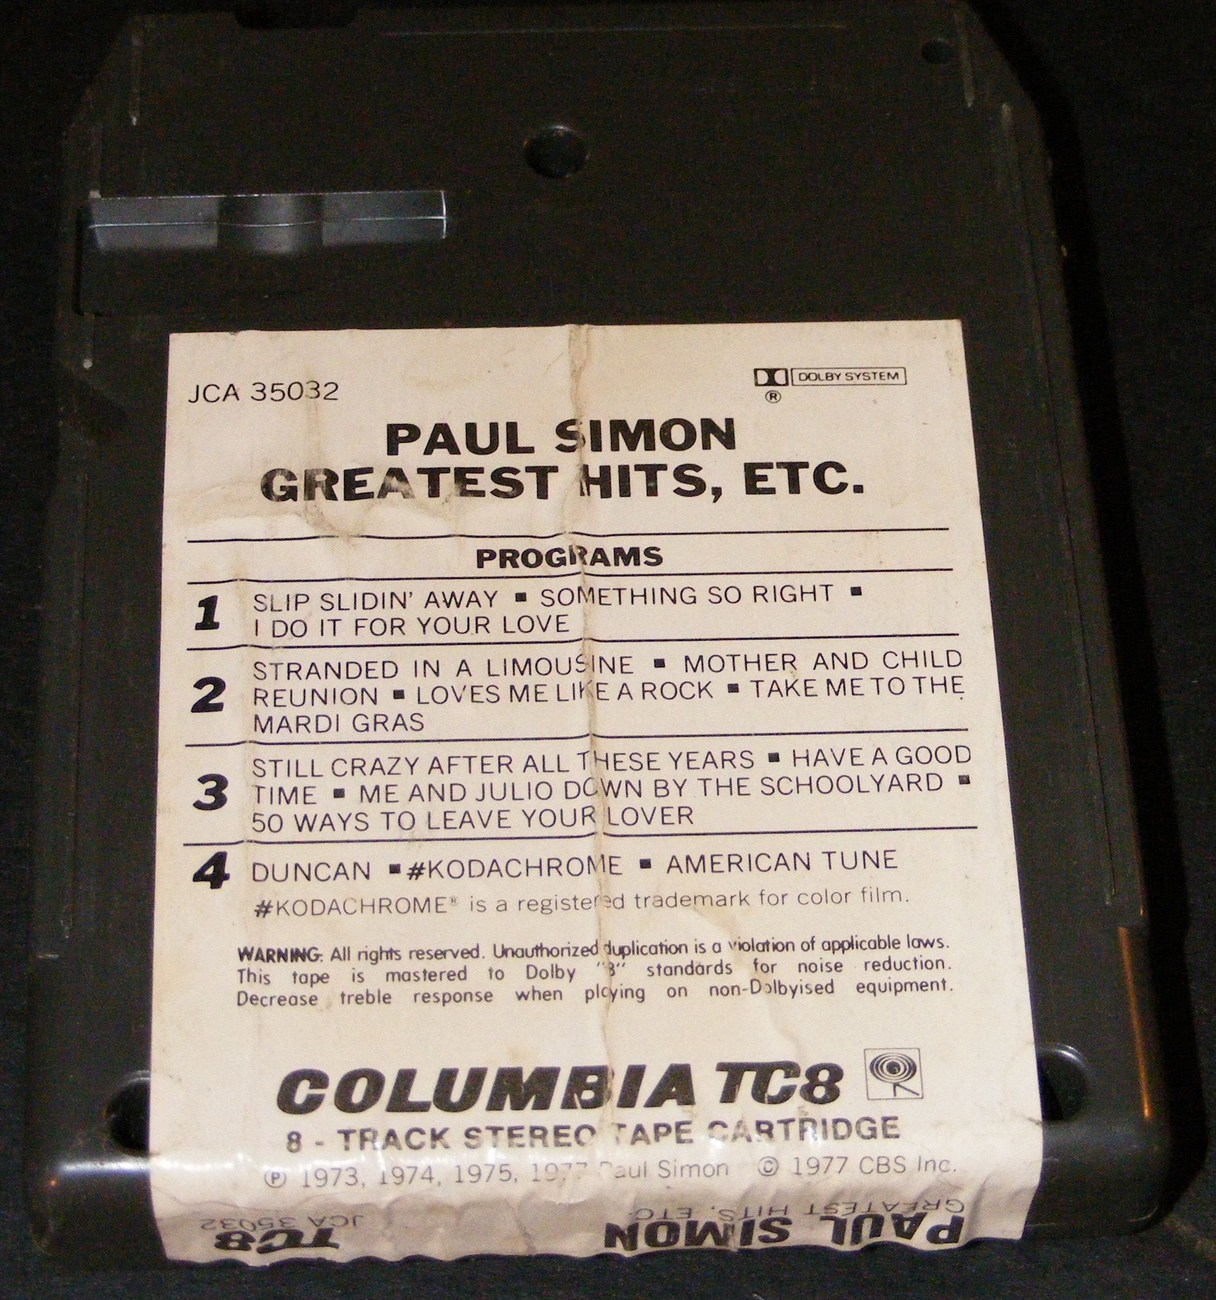 Paul Simon Greatest Hits, Etc 8 Track